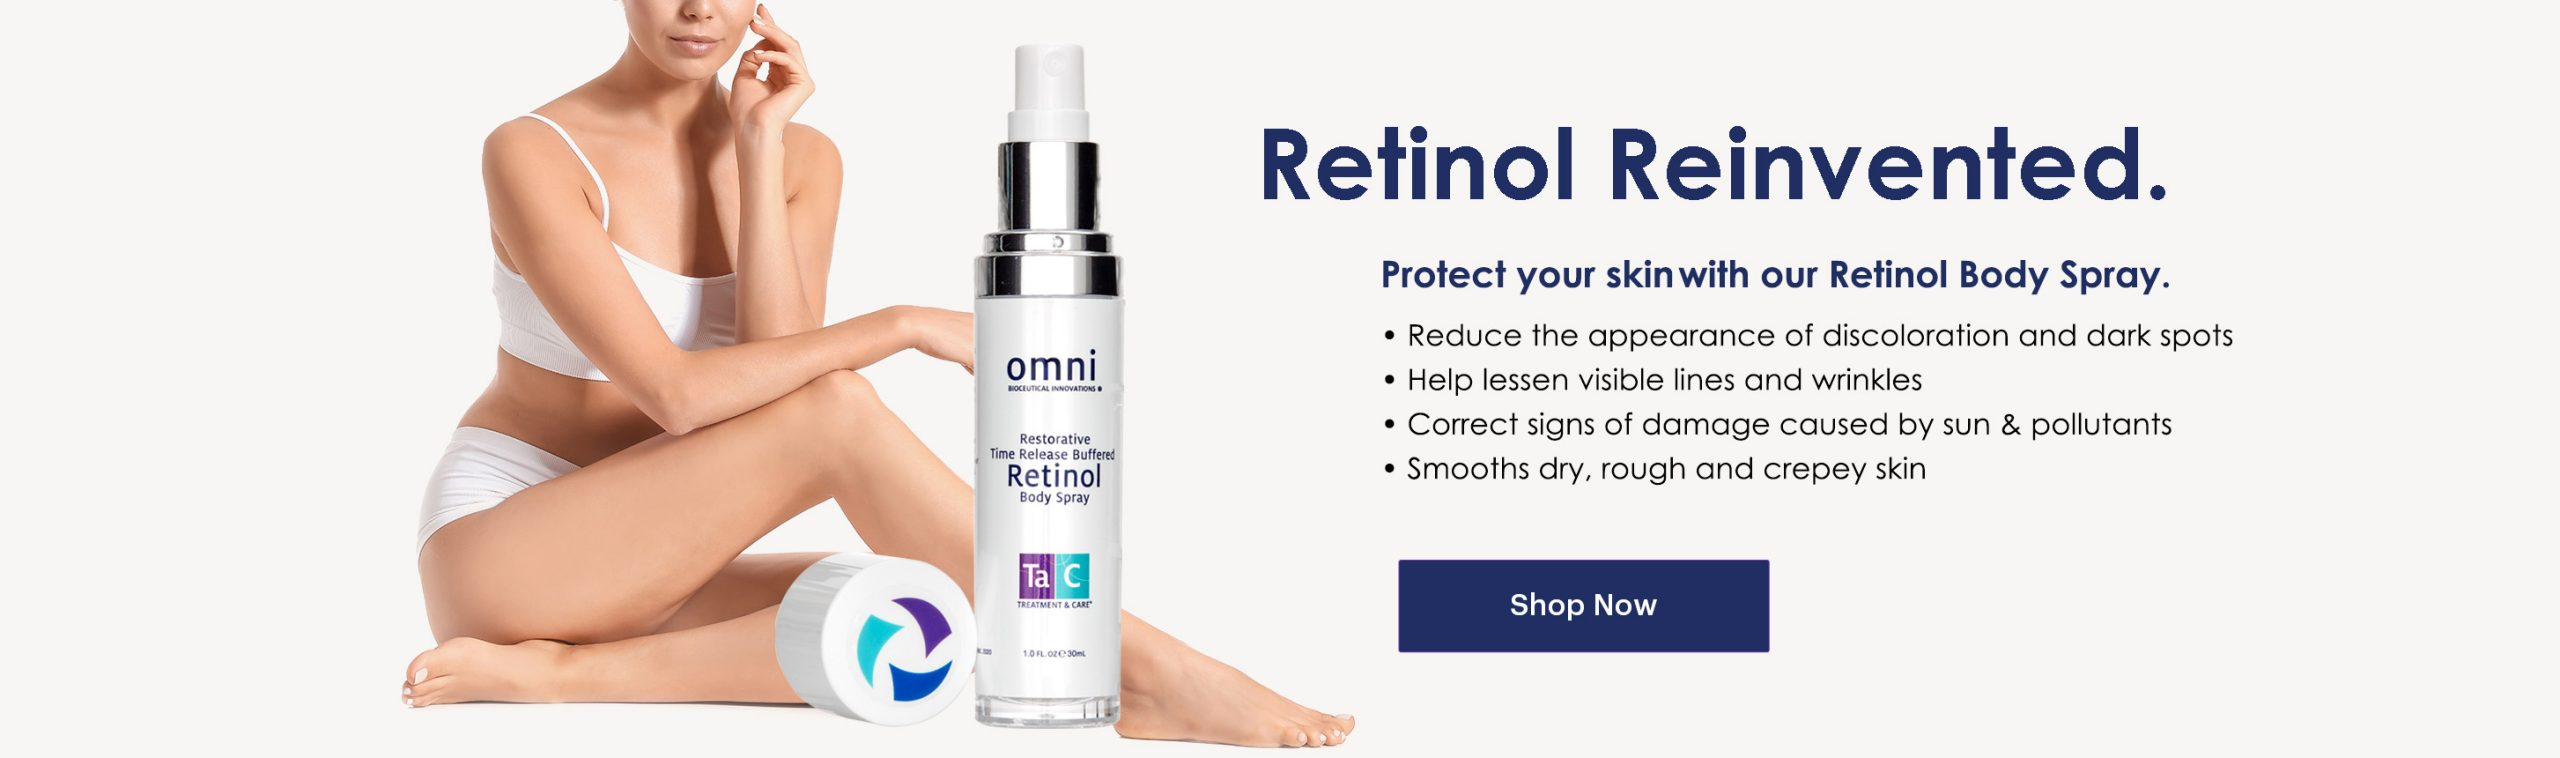 Retinol Body Spray